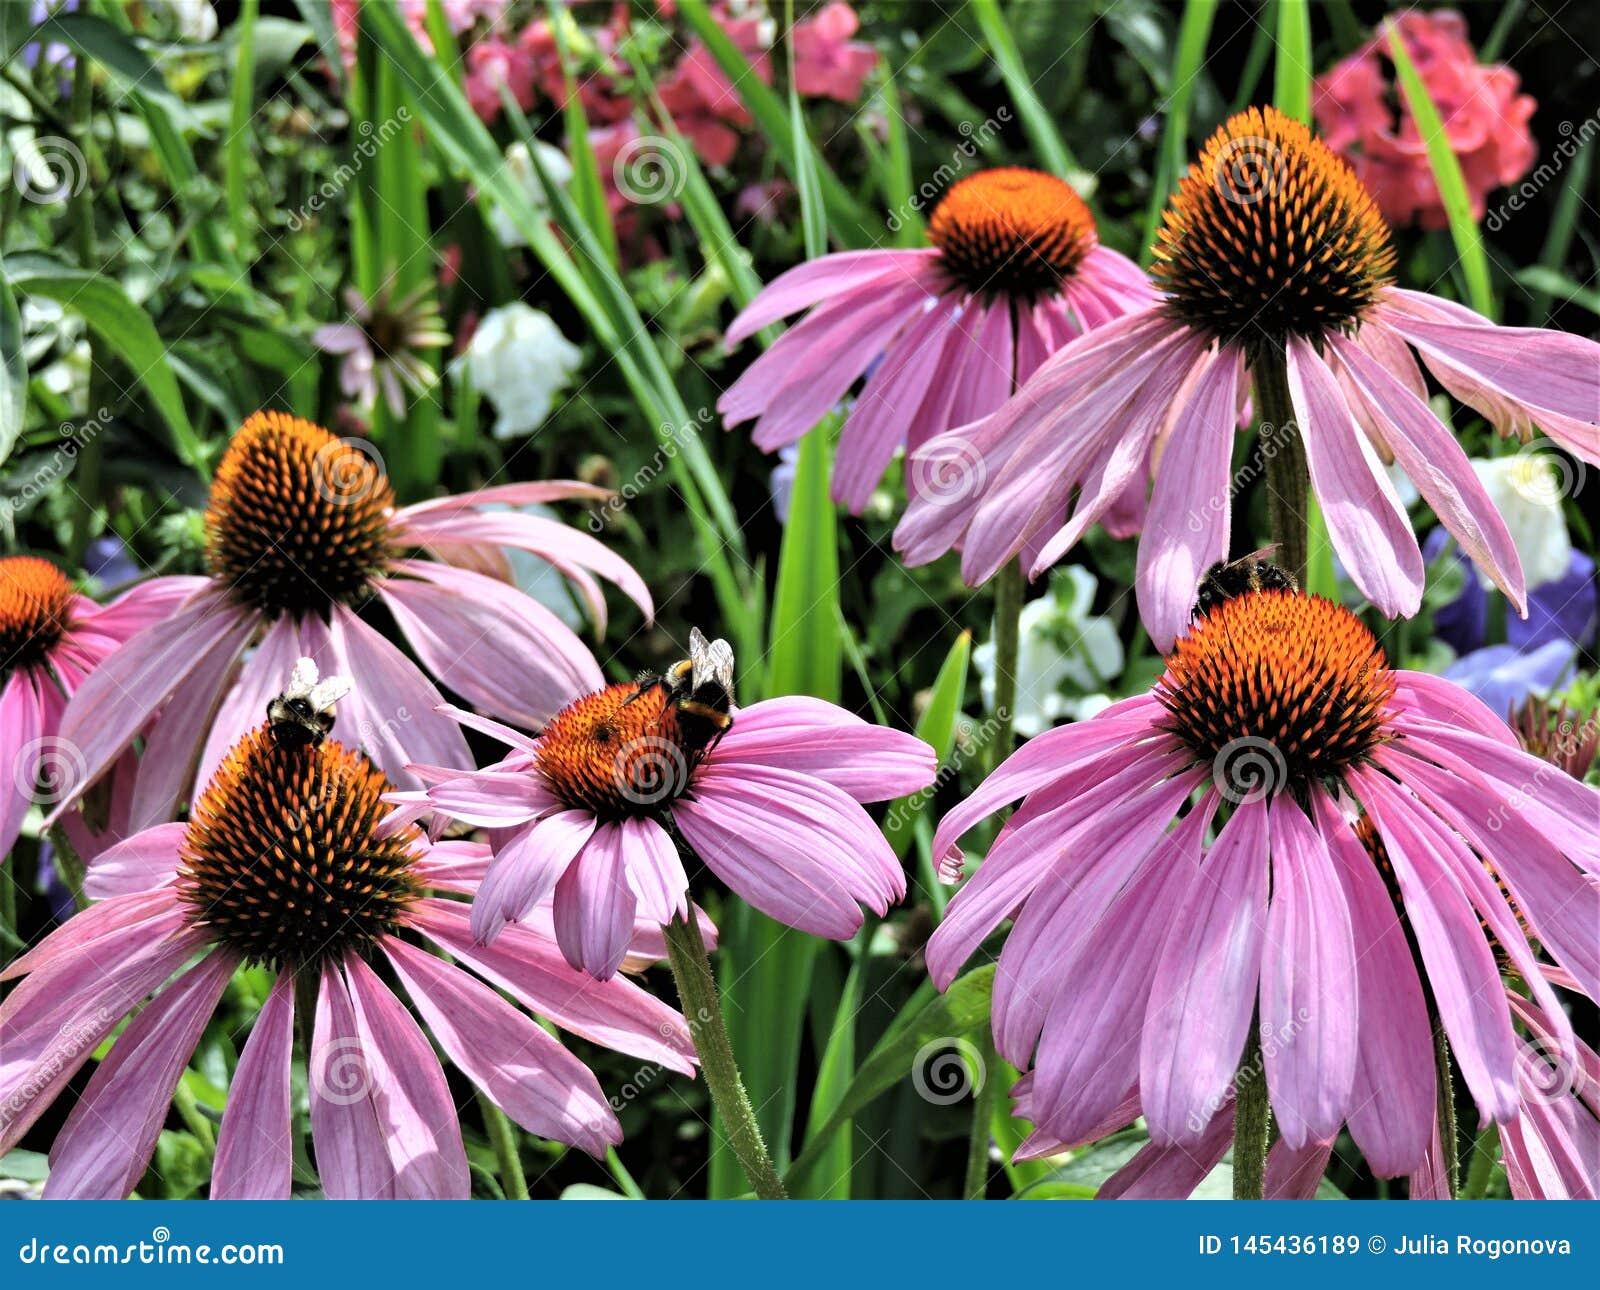 Pink echinacea flowers with bee in botanical garden of Helsinki